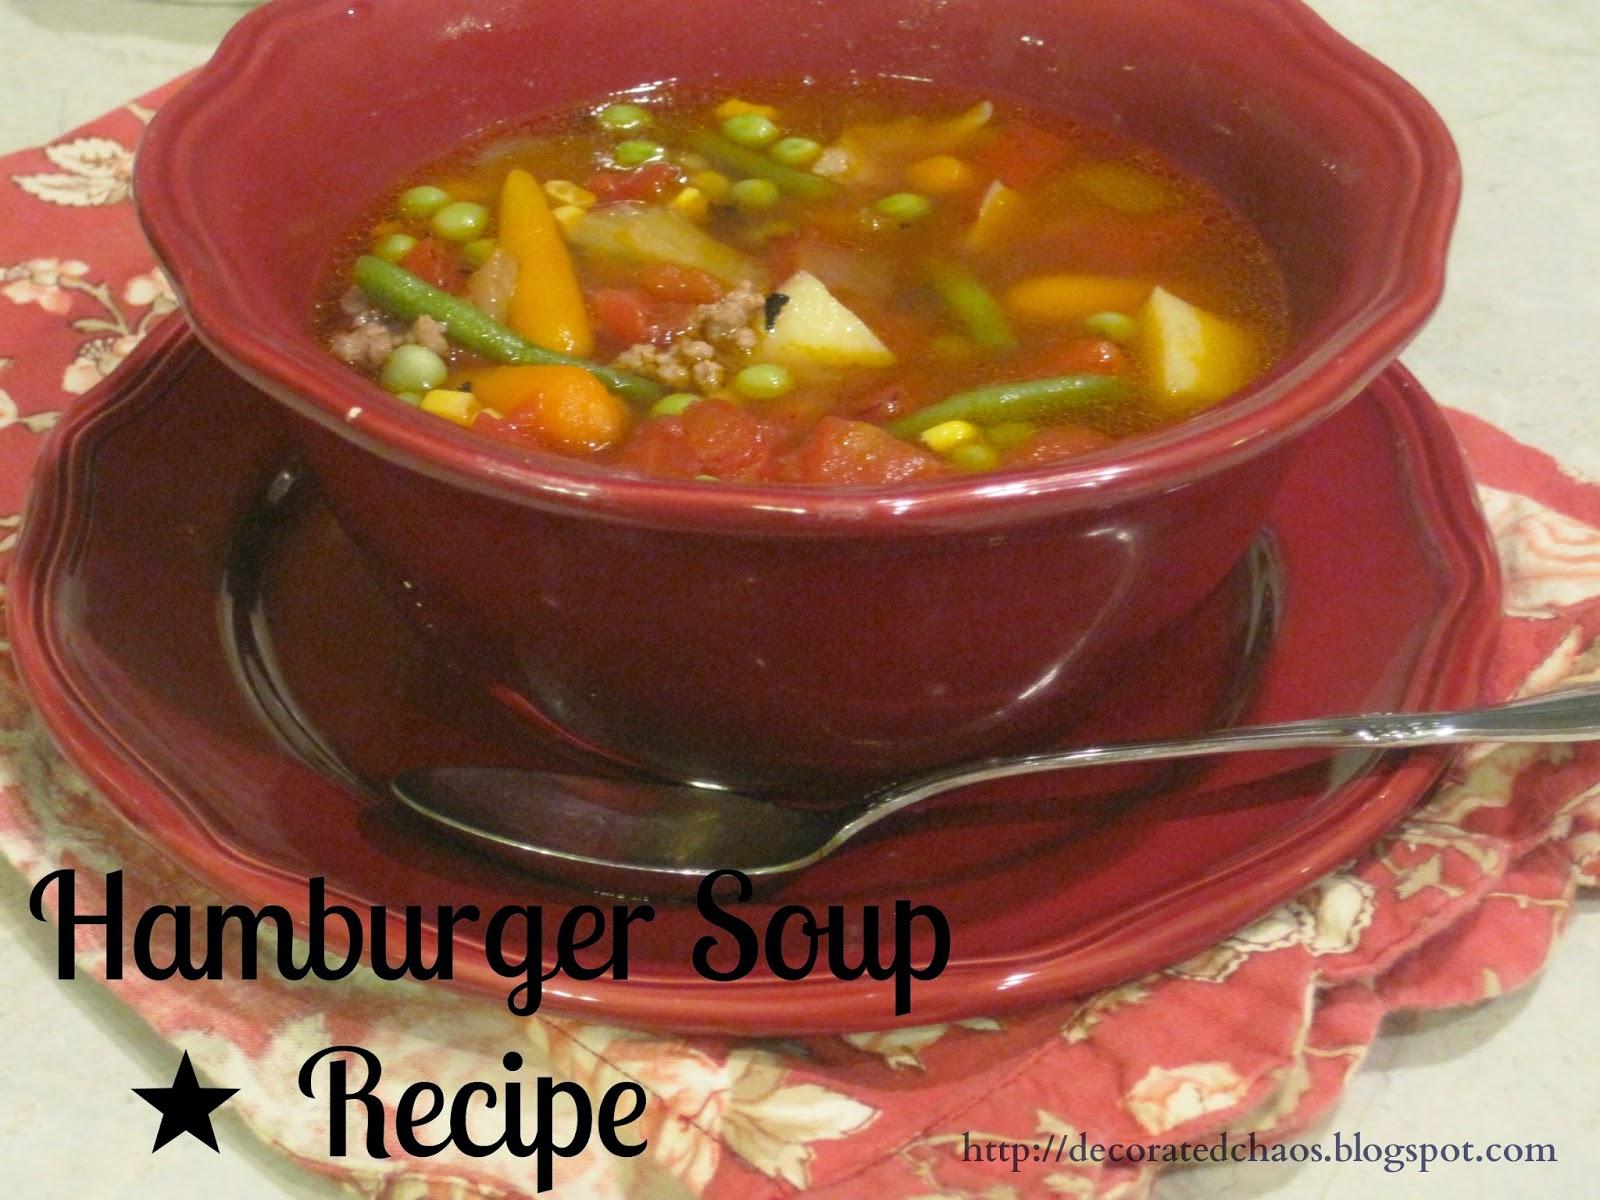 http://decoratedchaos.blogspot.com/2013/10/hamburger-soup-recipe.html